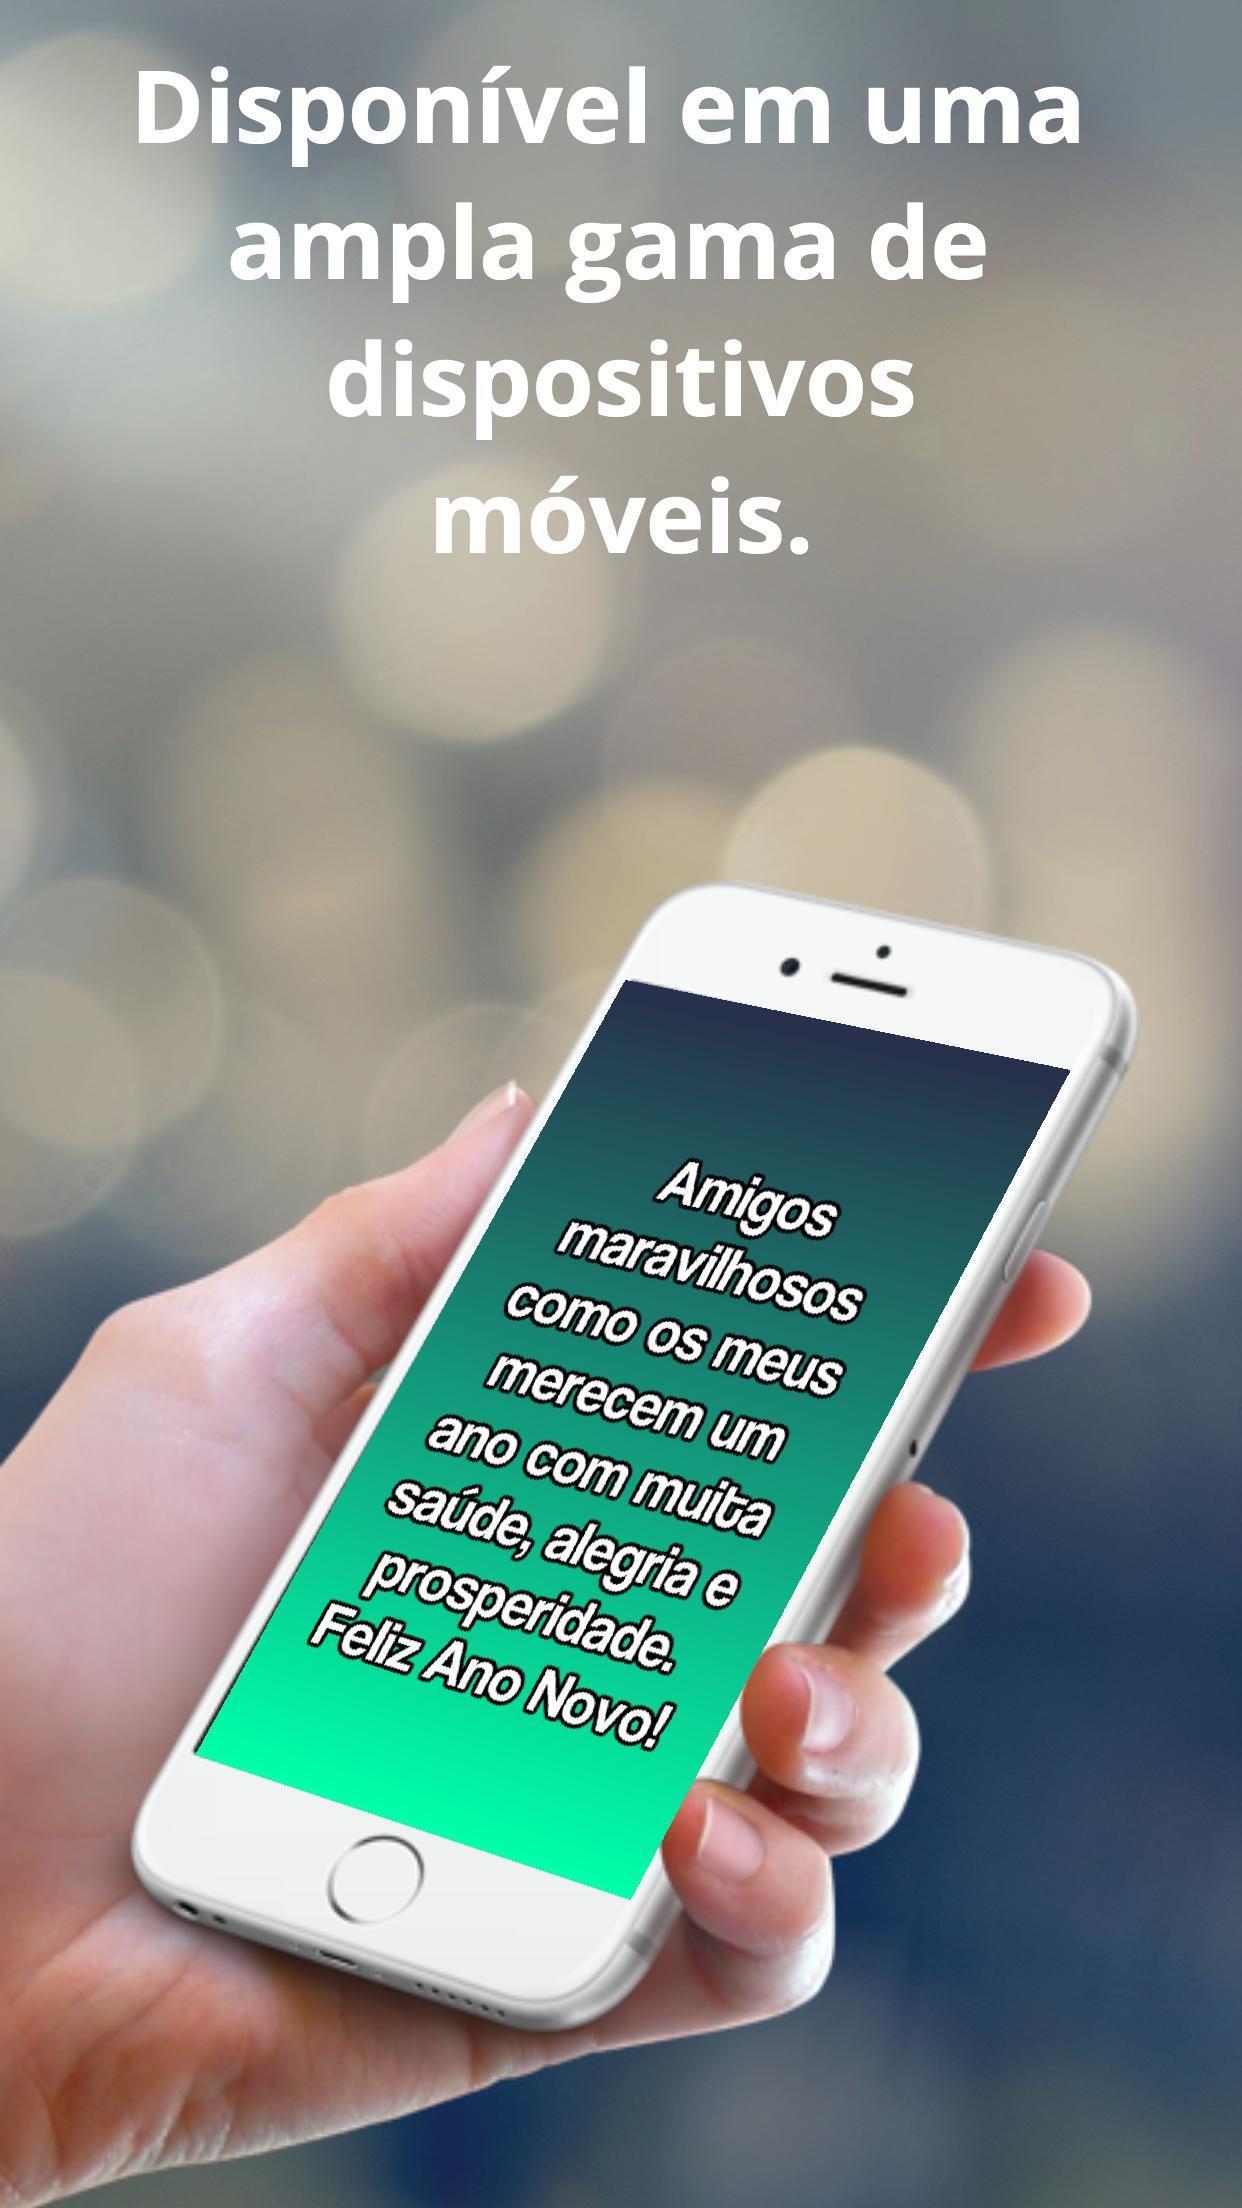 Frases De Feliz Ano Novo For Android Apk Download